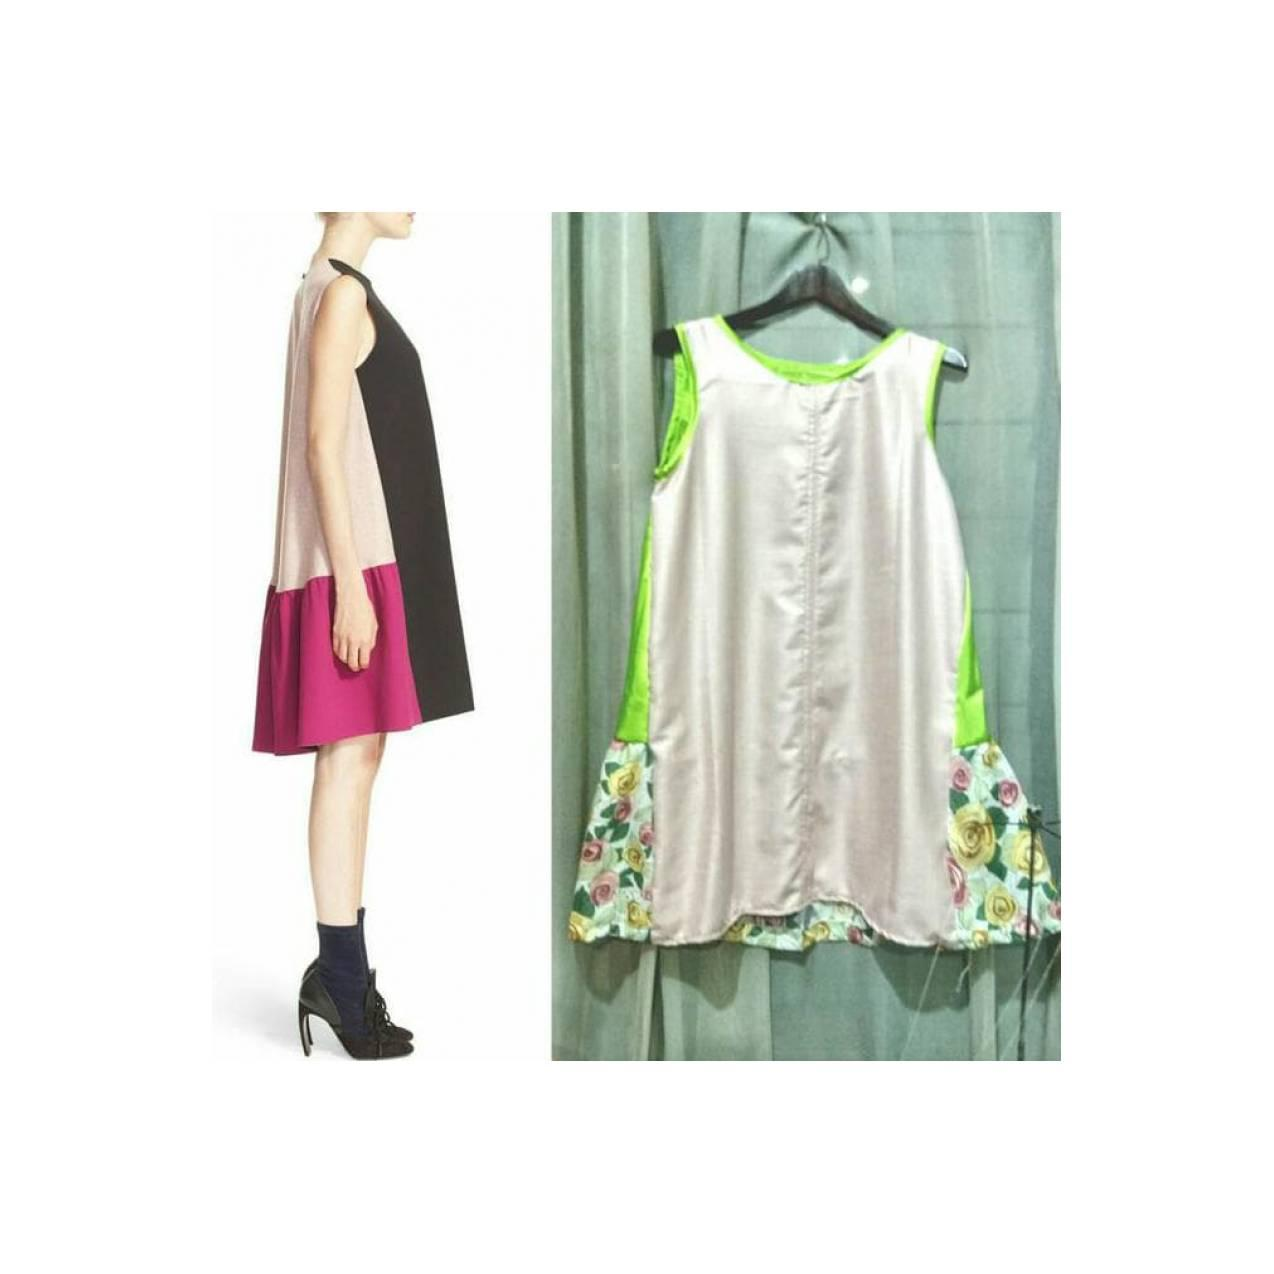 Jual Dress Color Blok 3 Tone Terima Jahit Dress Celana Rok Kaftan Dll